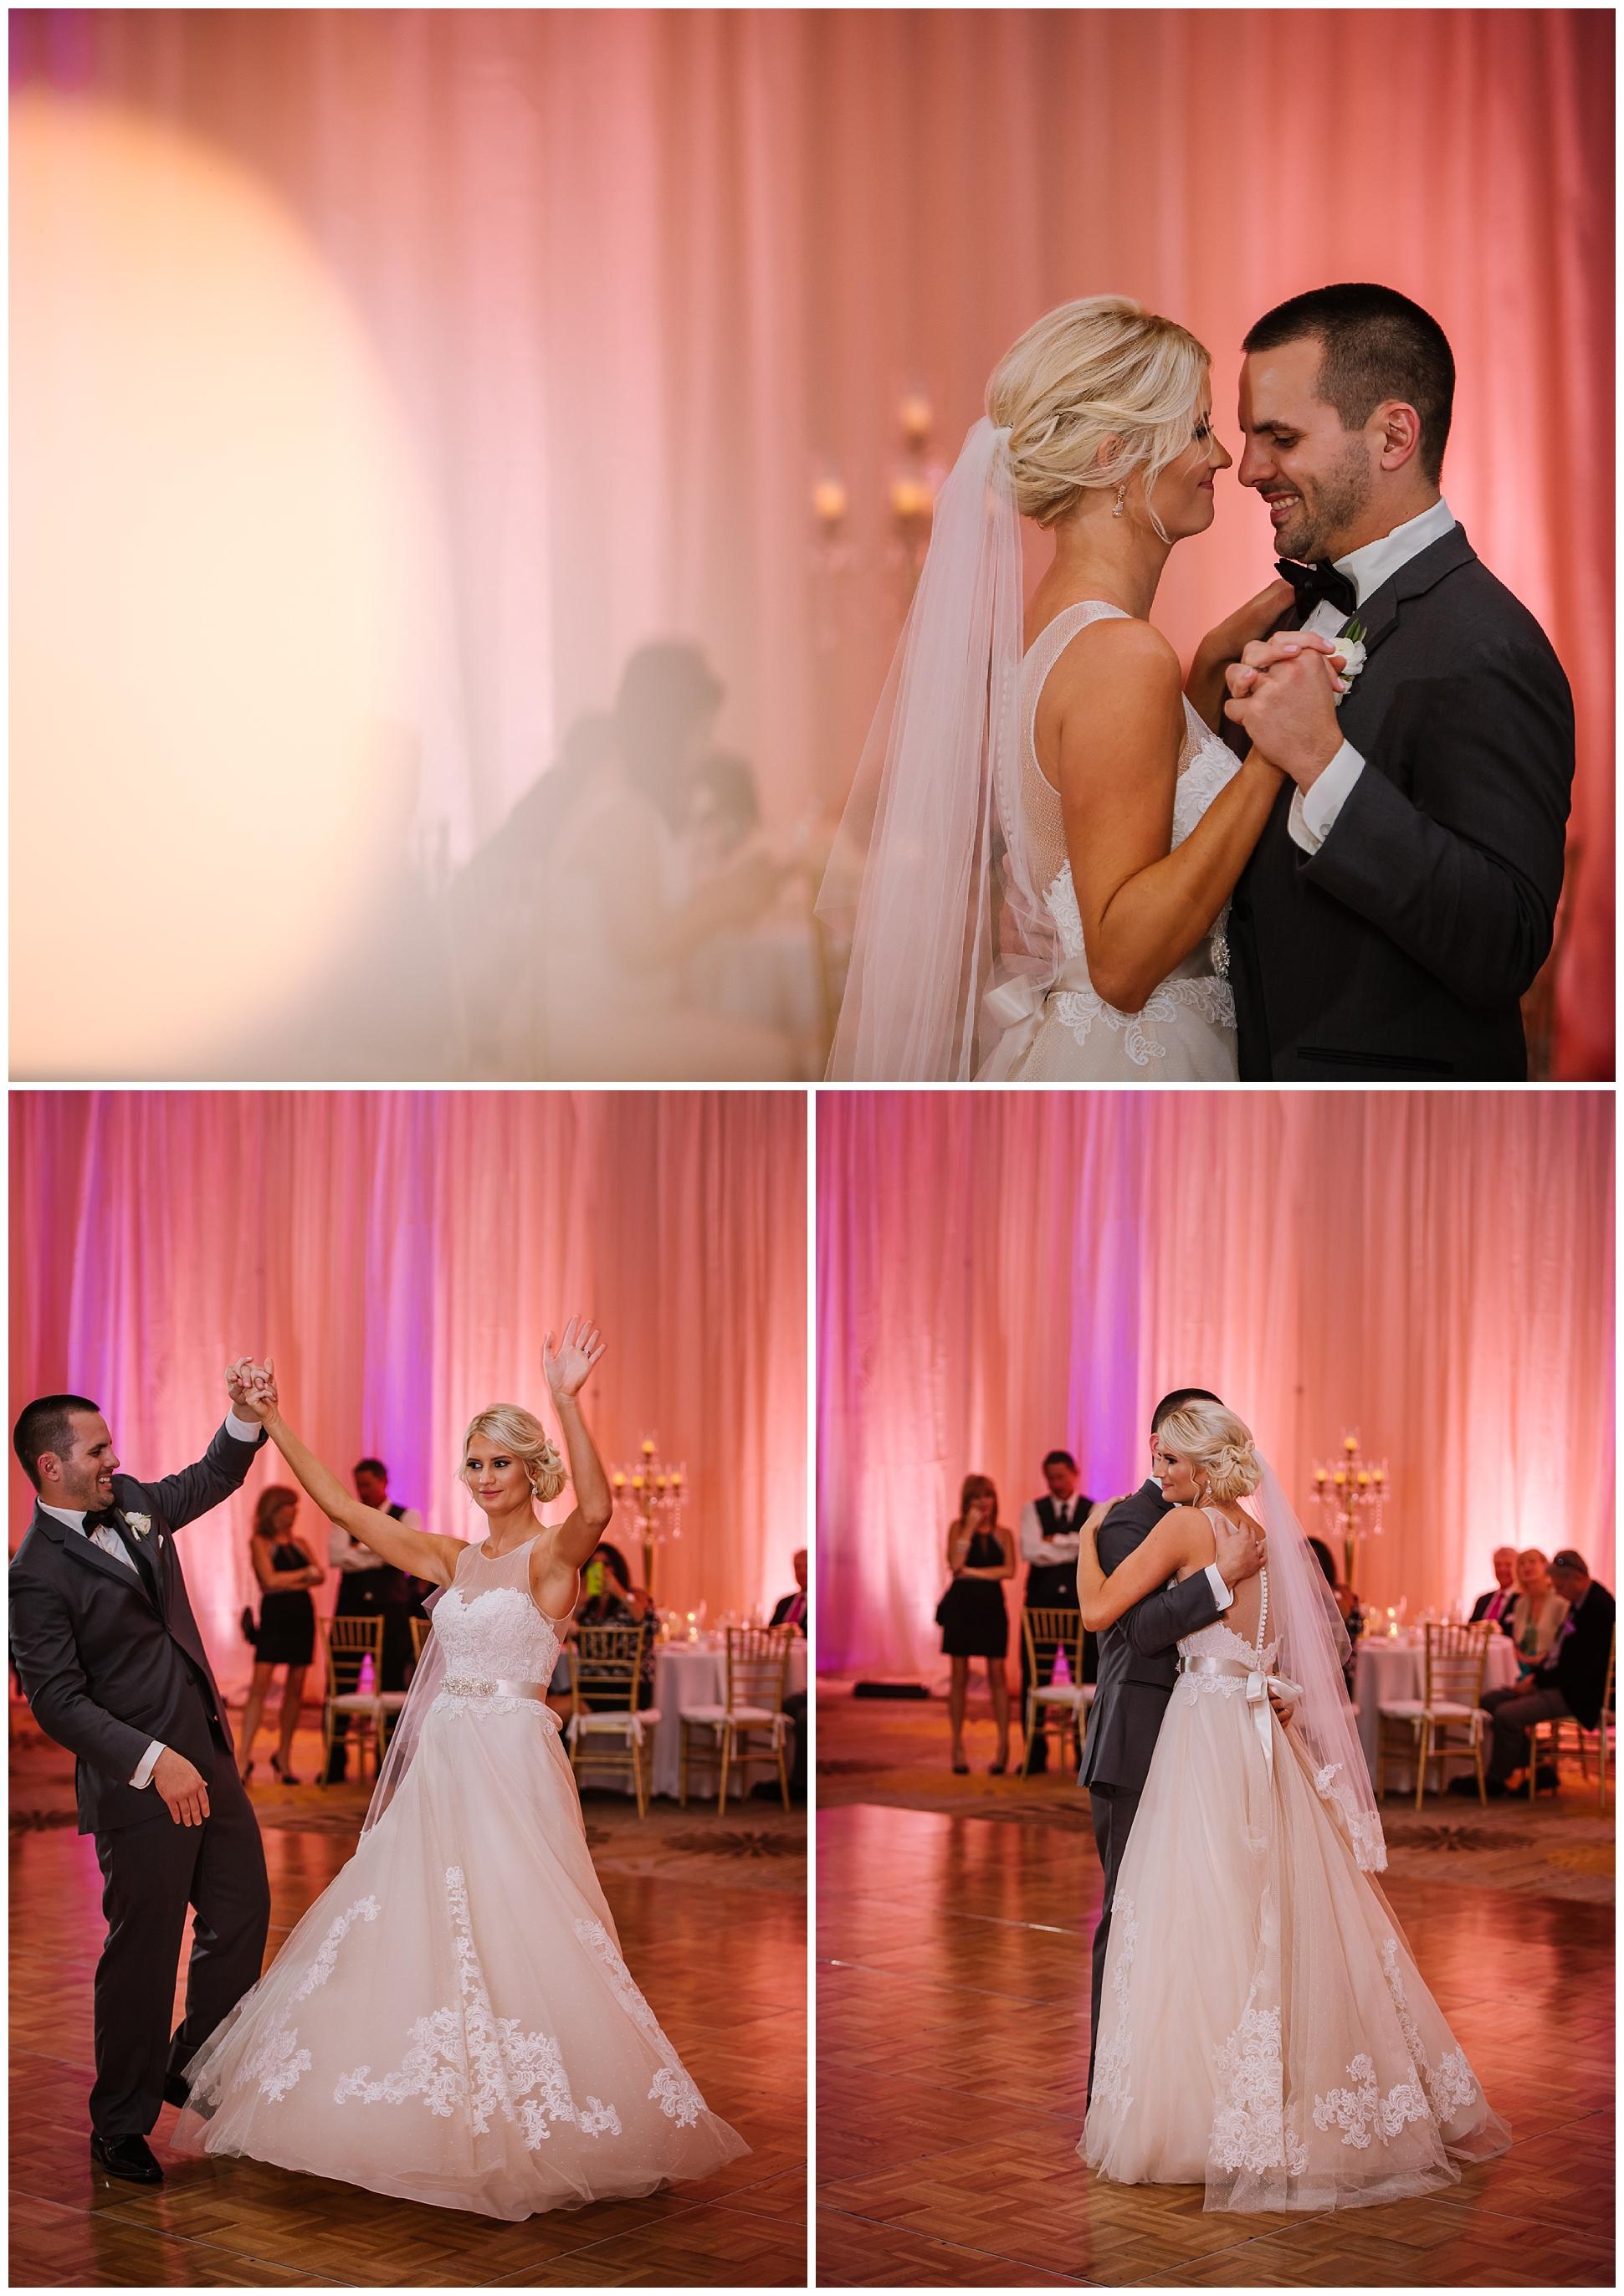 Sarasota-wedding-photographer-hyatt-regency-blush_0059.jpg